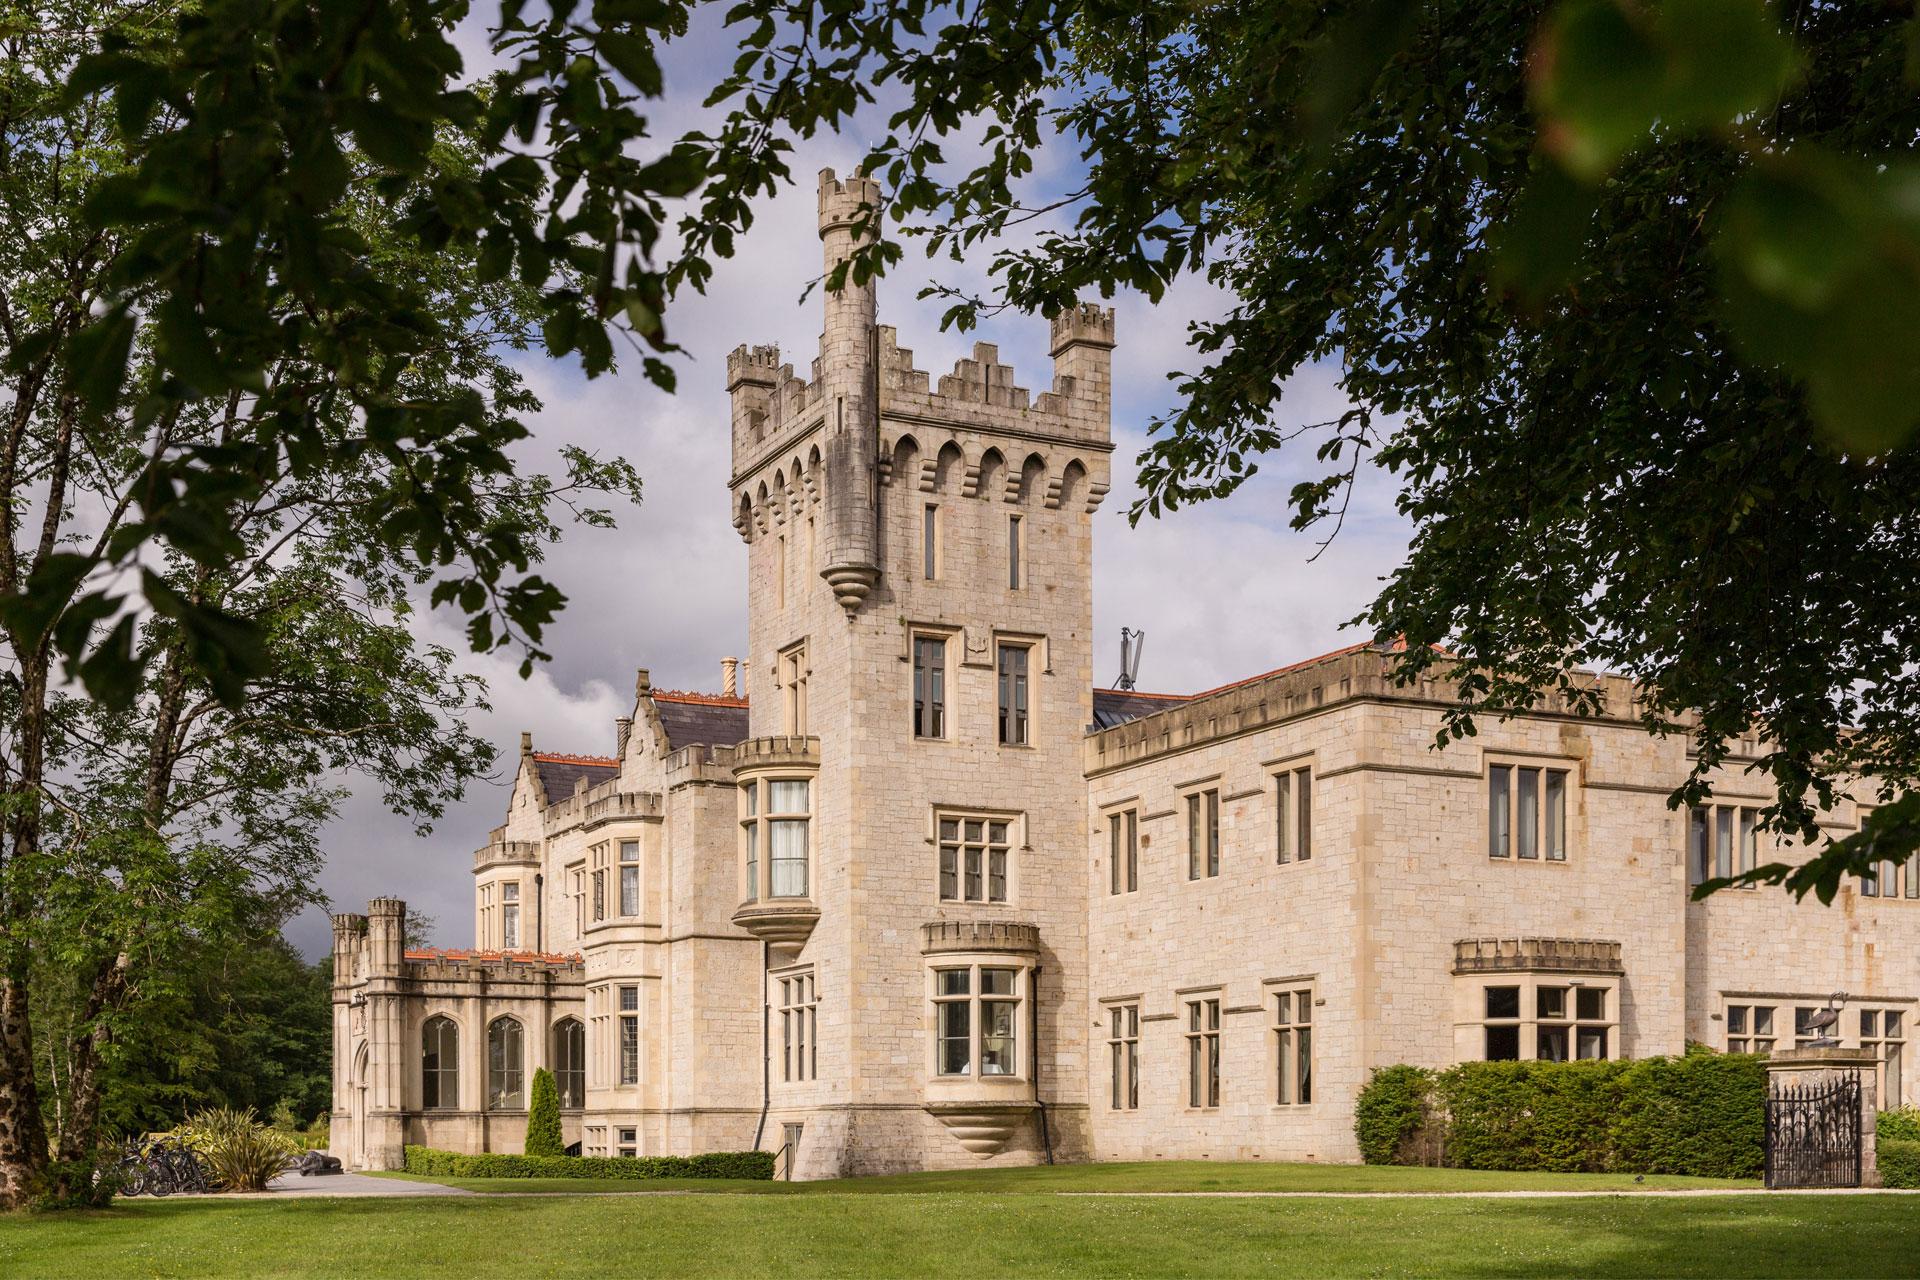 Lough-Eske-Castle-day-harco.jpg